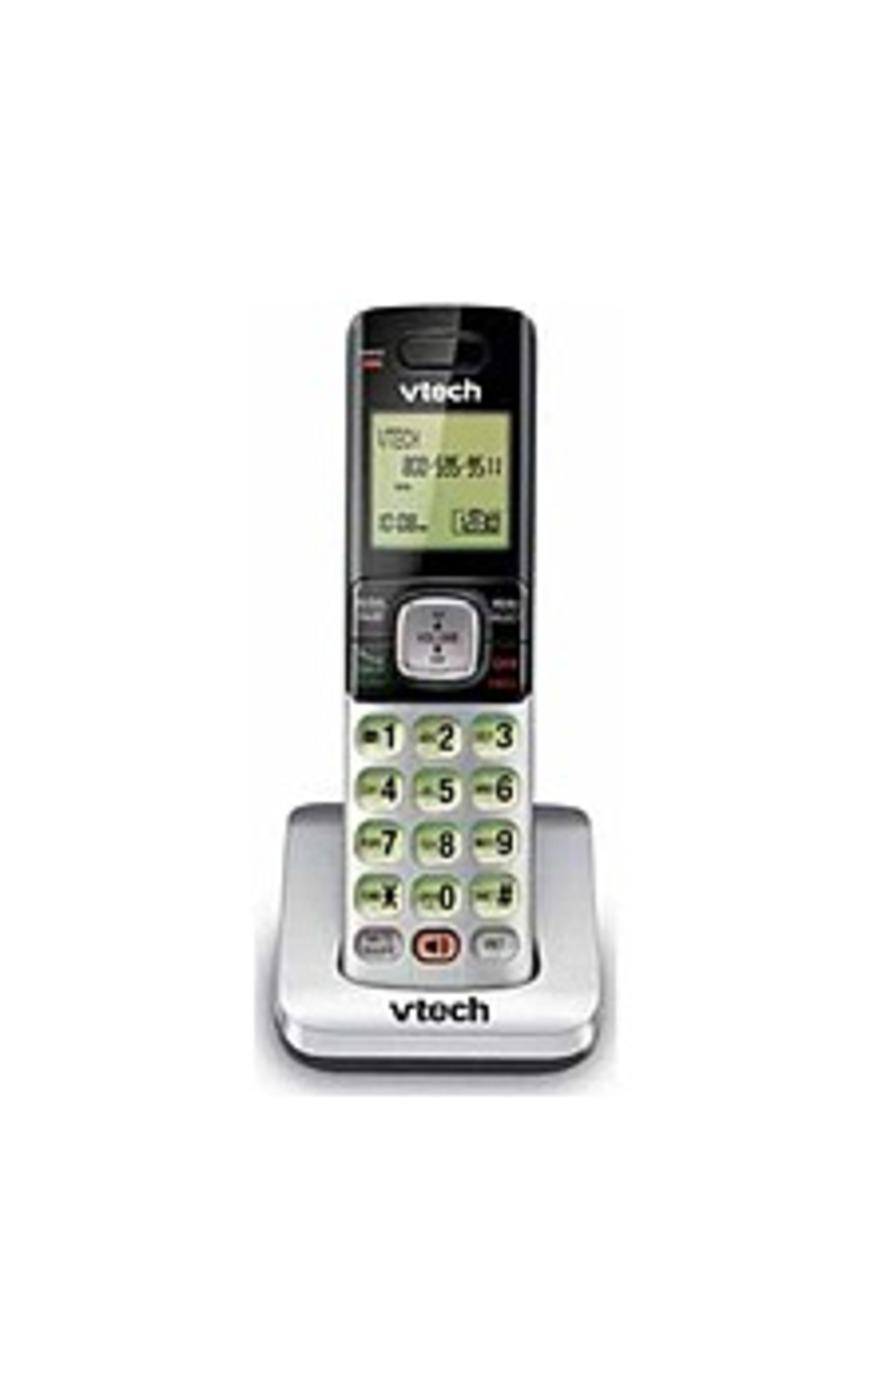 VTech CS6709 Accessory Handset Cordless Phone - DECT 6.0 - Caller ID - Black, Silver